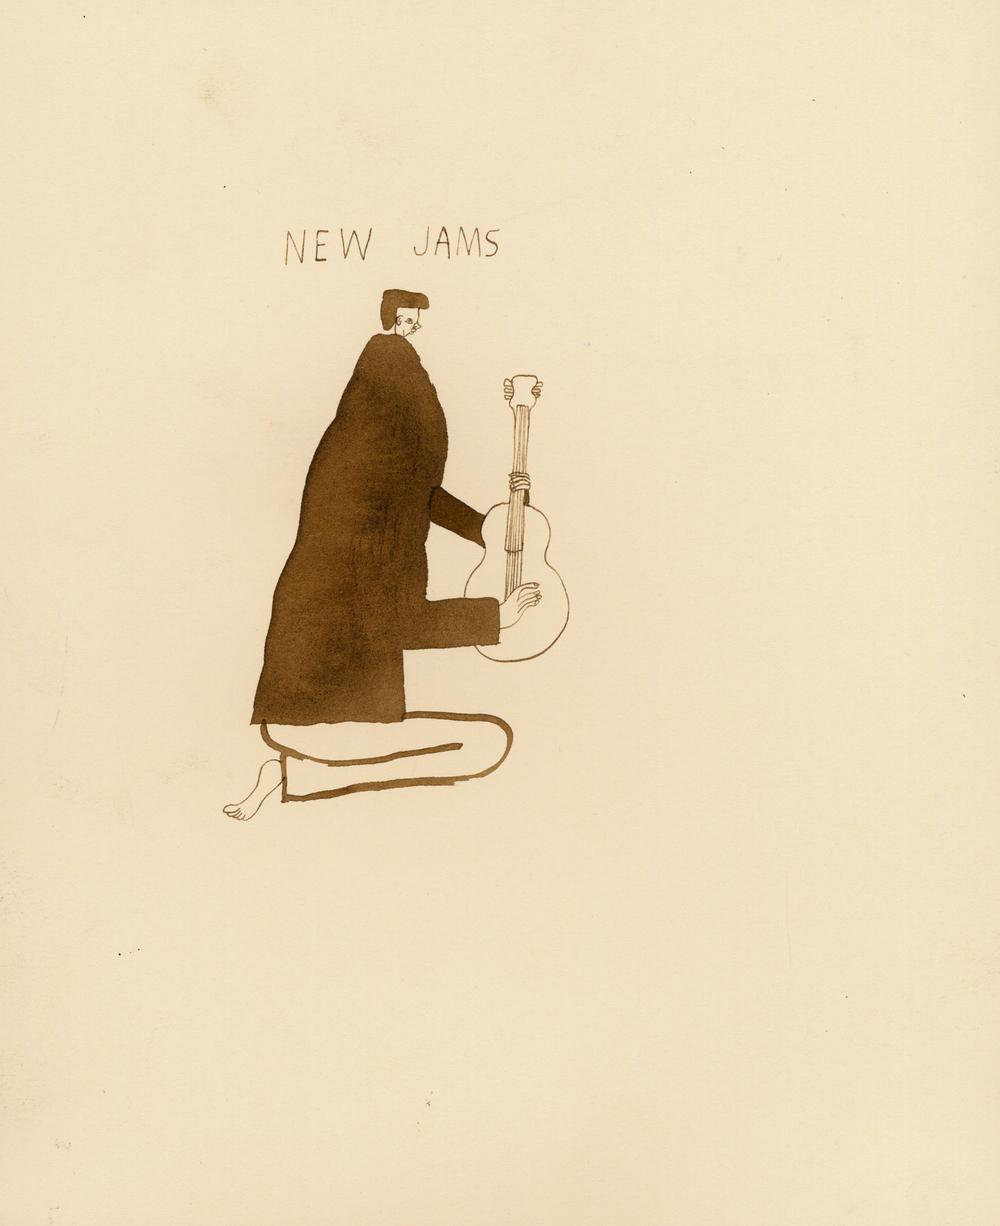 newjams.jpg